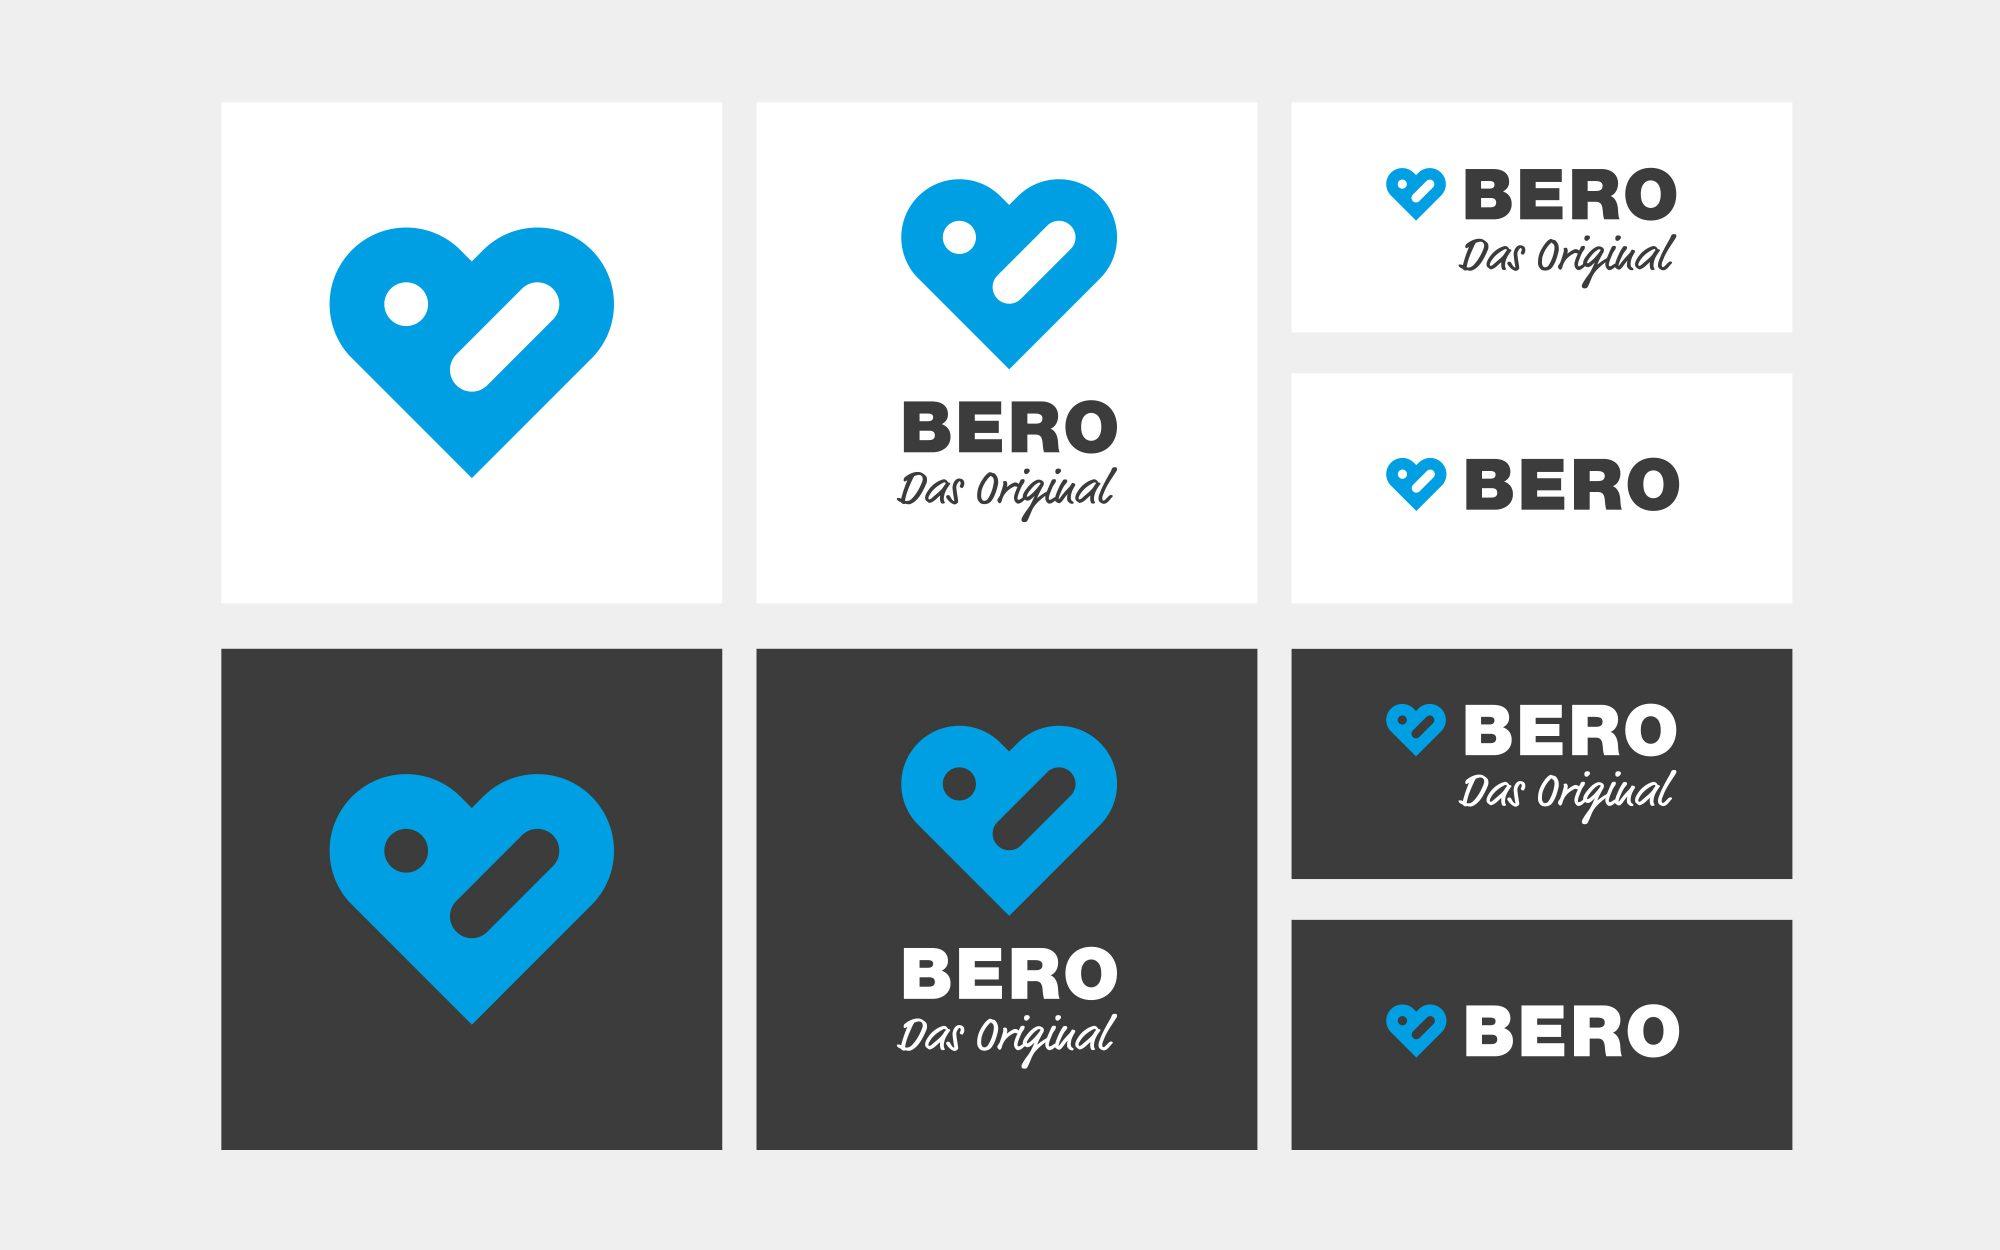 GRACO-Bero-Corporate-Design-Branding-Marke